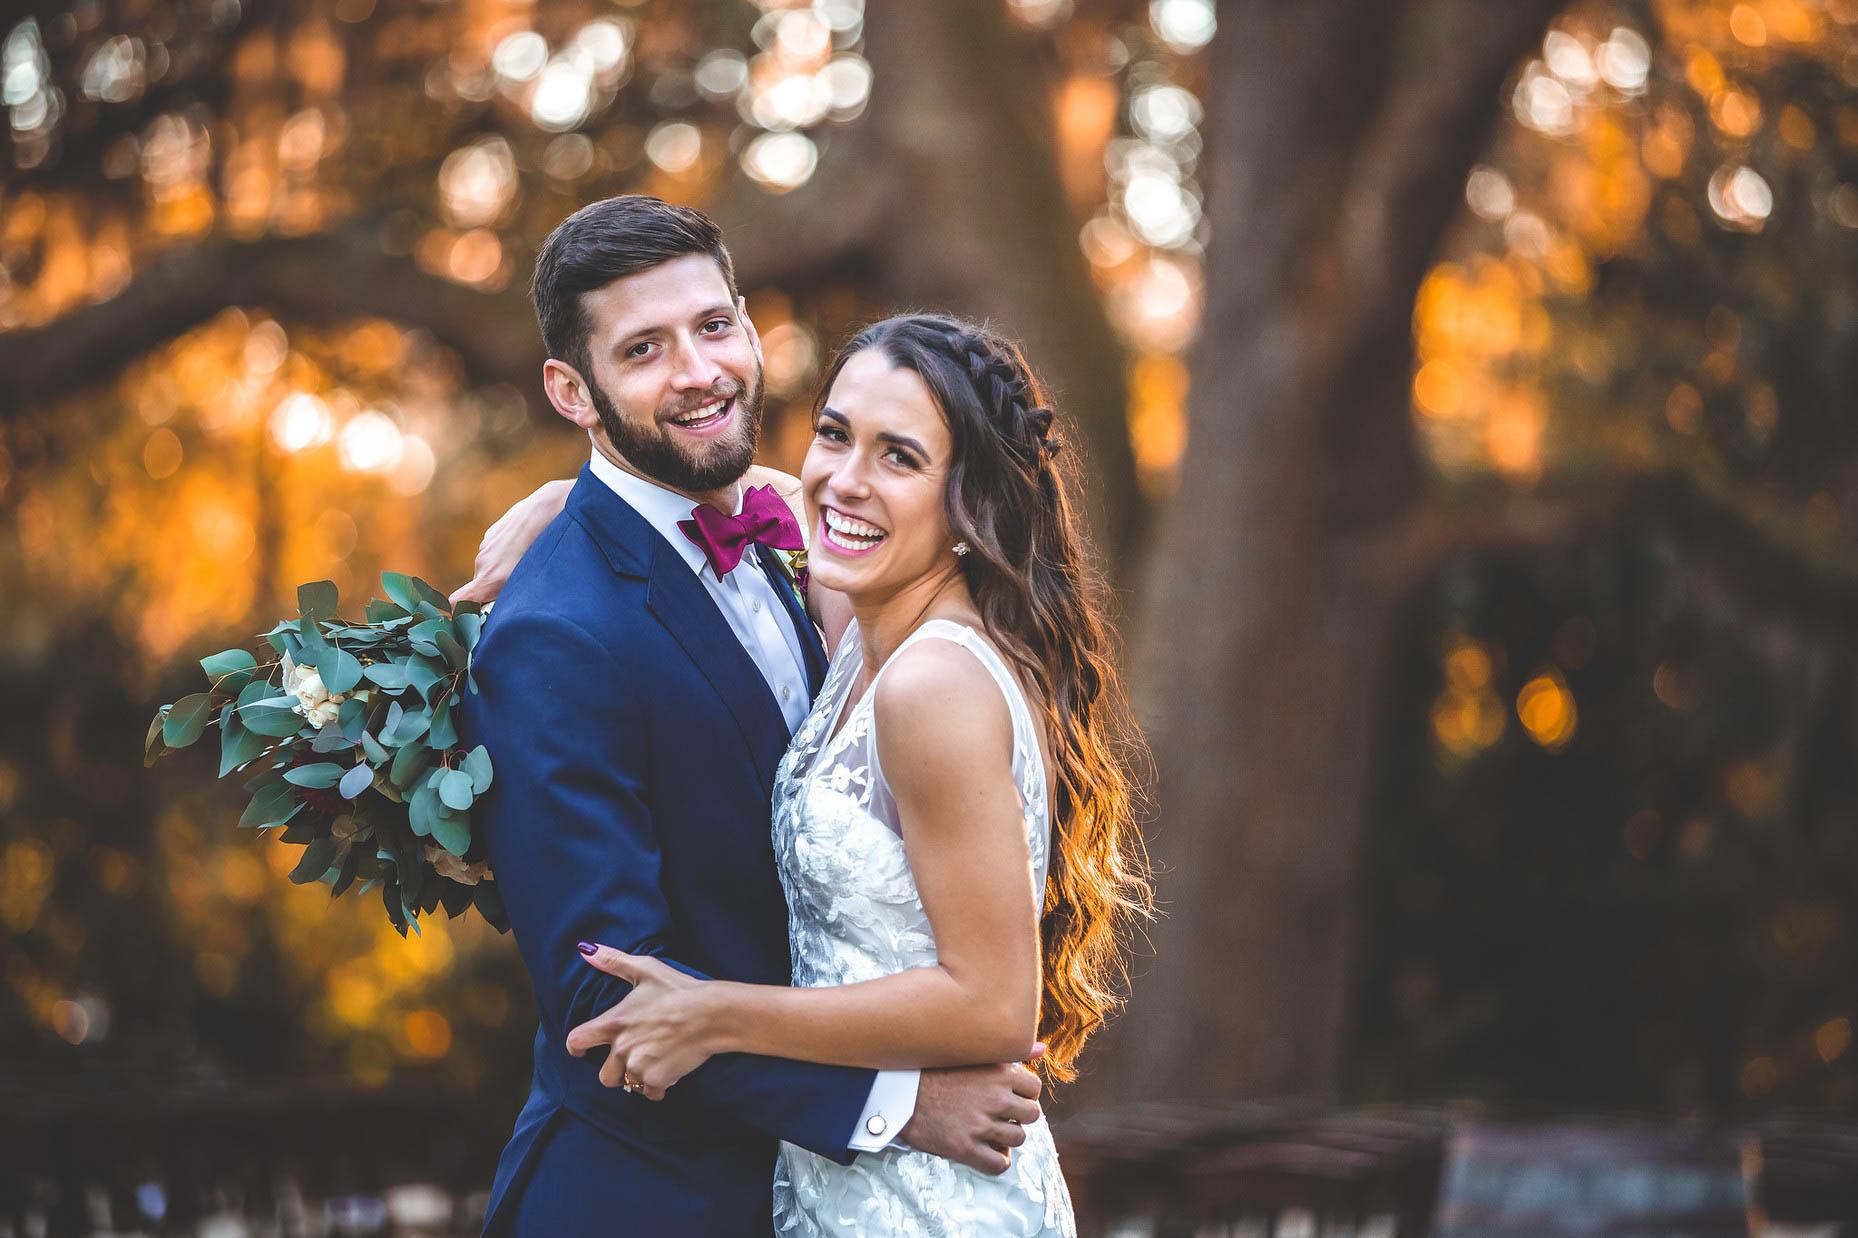 adam-szarmack-bowing-oaks-wedding-photographer-jacksonville-14.jpg